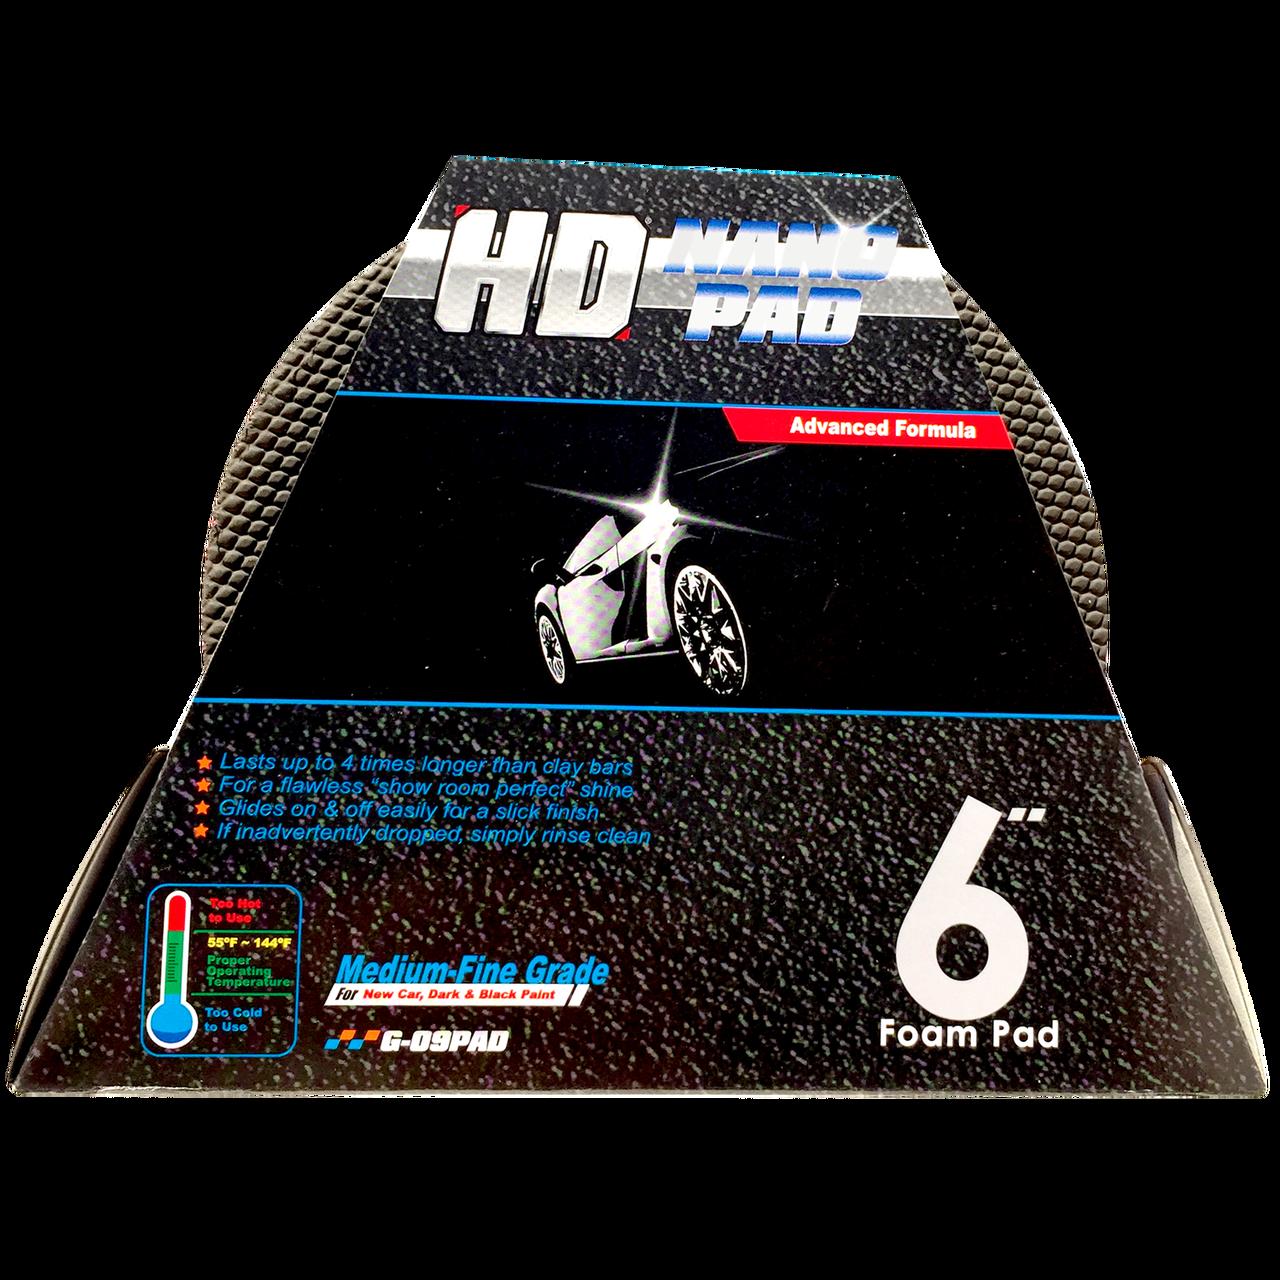 HD Nano Pad - Clay Bar Alternative